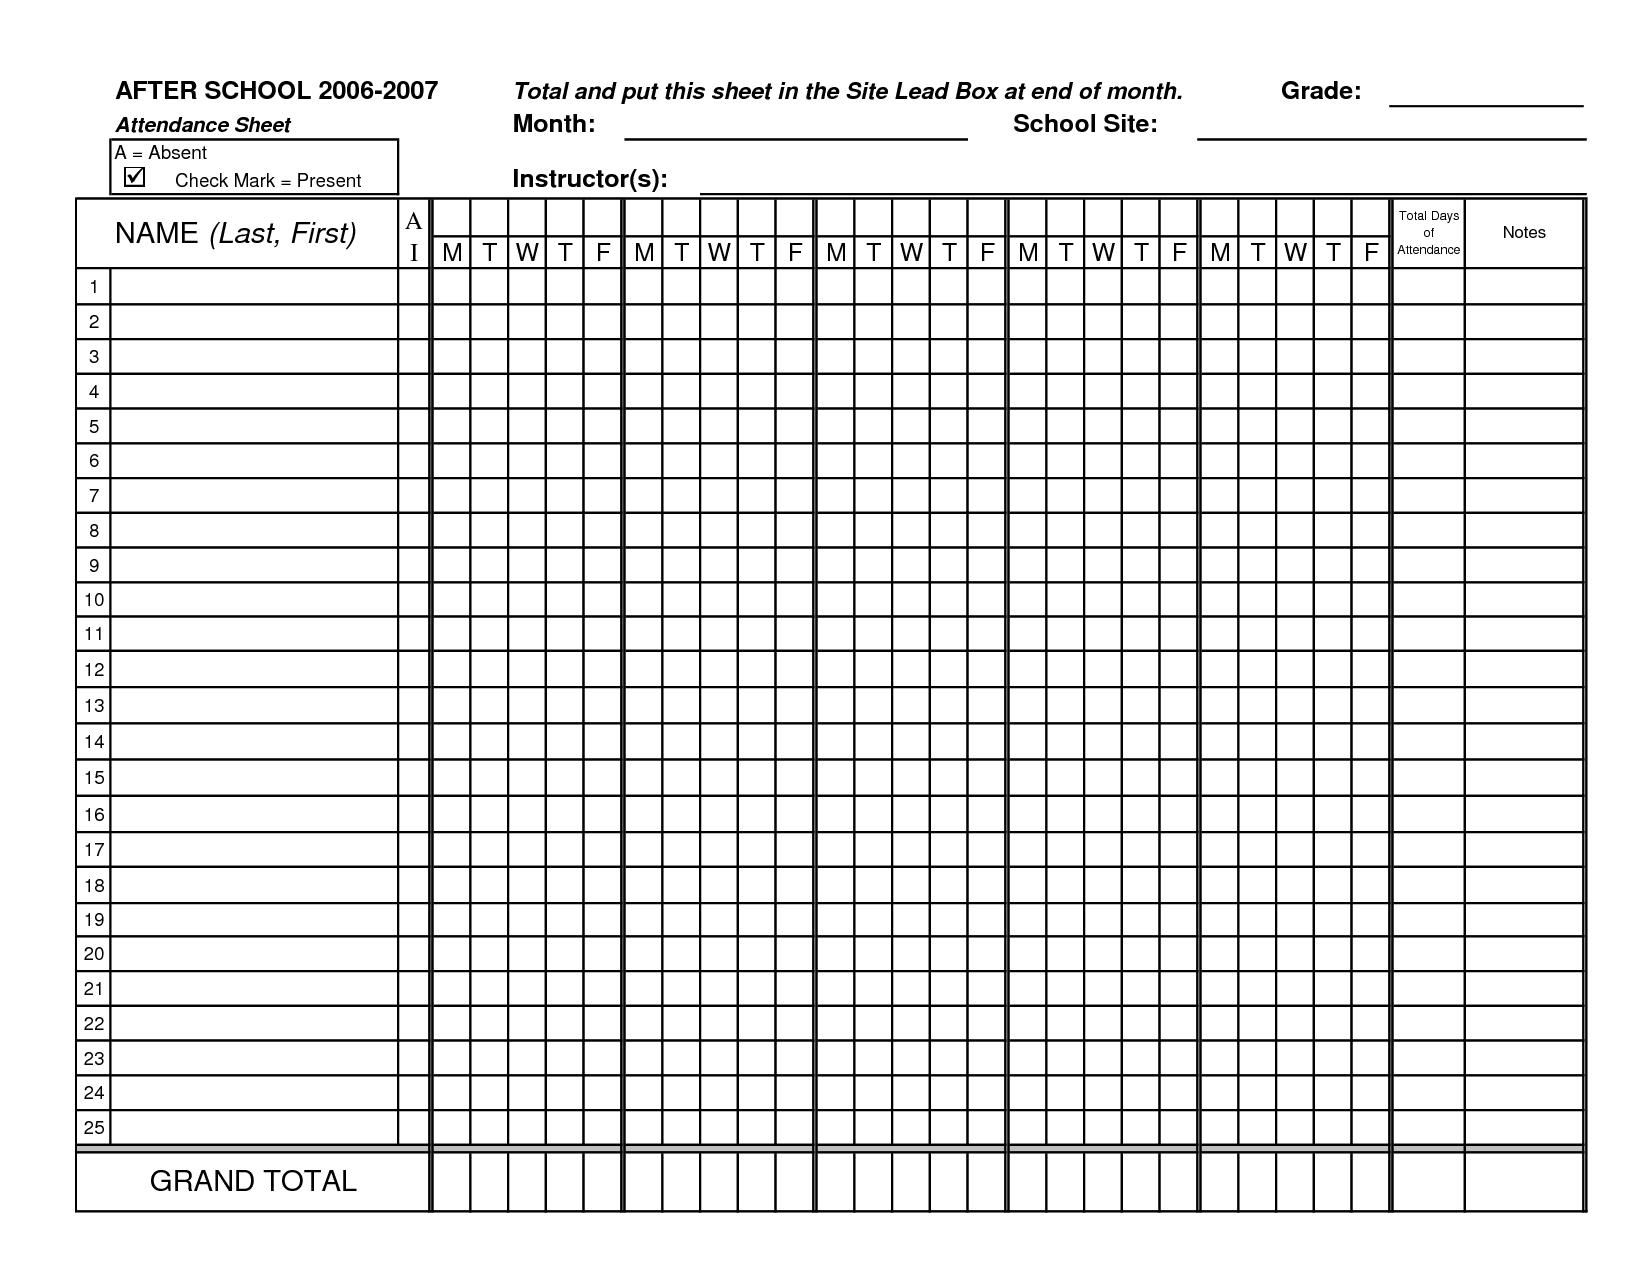 Class Attendance Sheets Download As Excel Cakepins